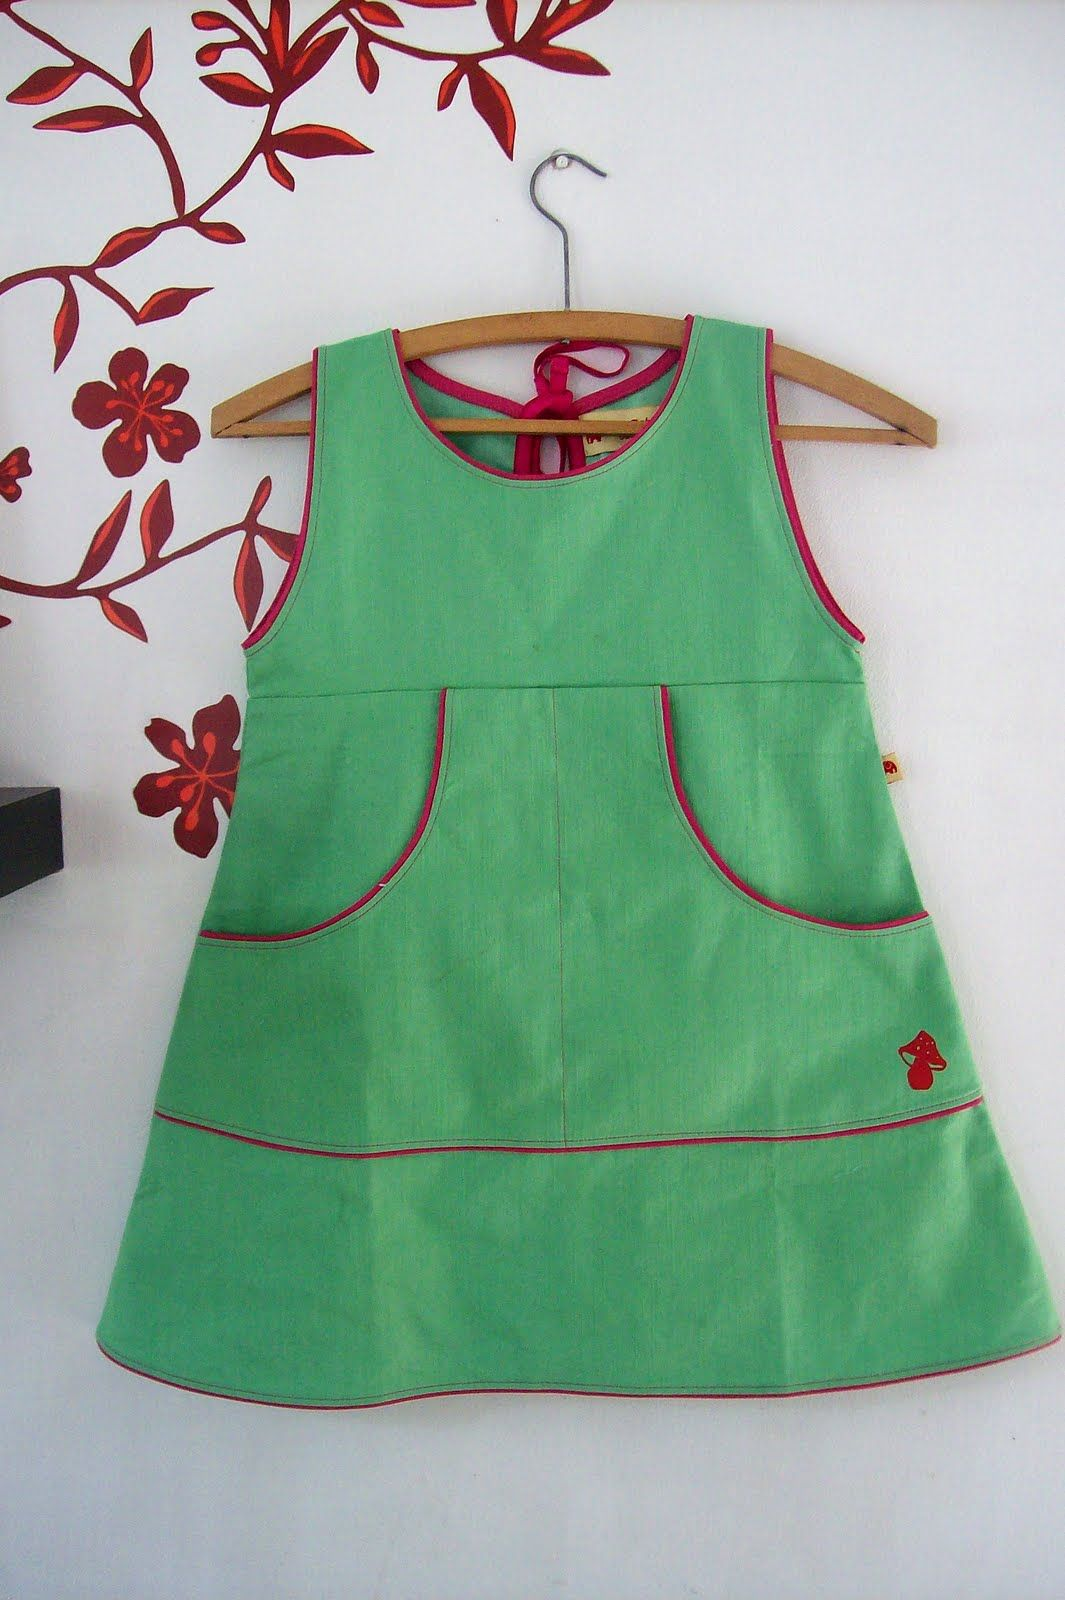 insp use plain jumper pattern & add pocket & piping. like the key ...